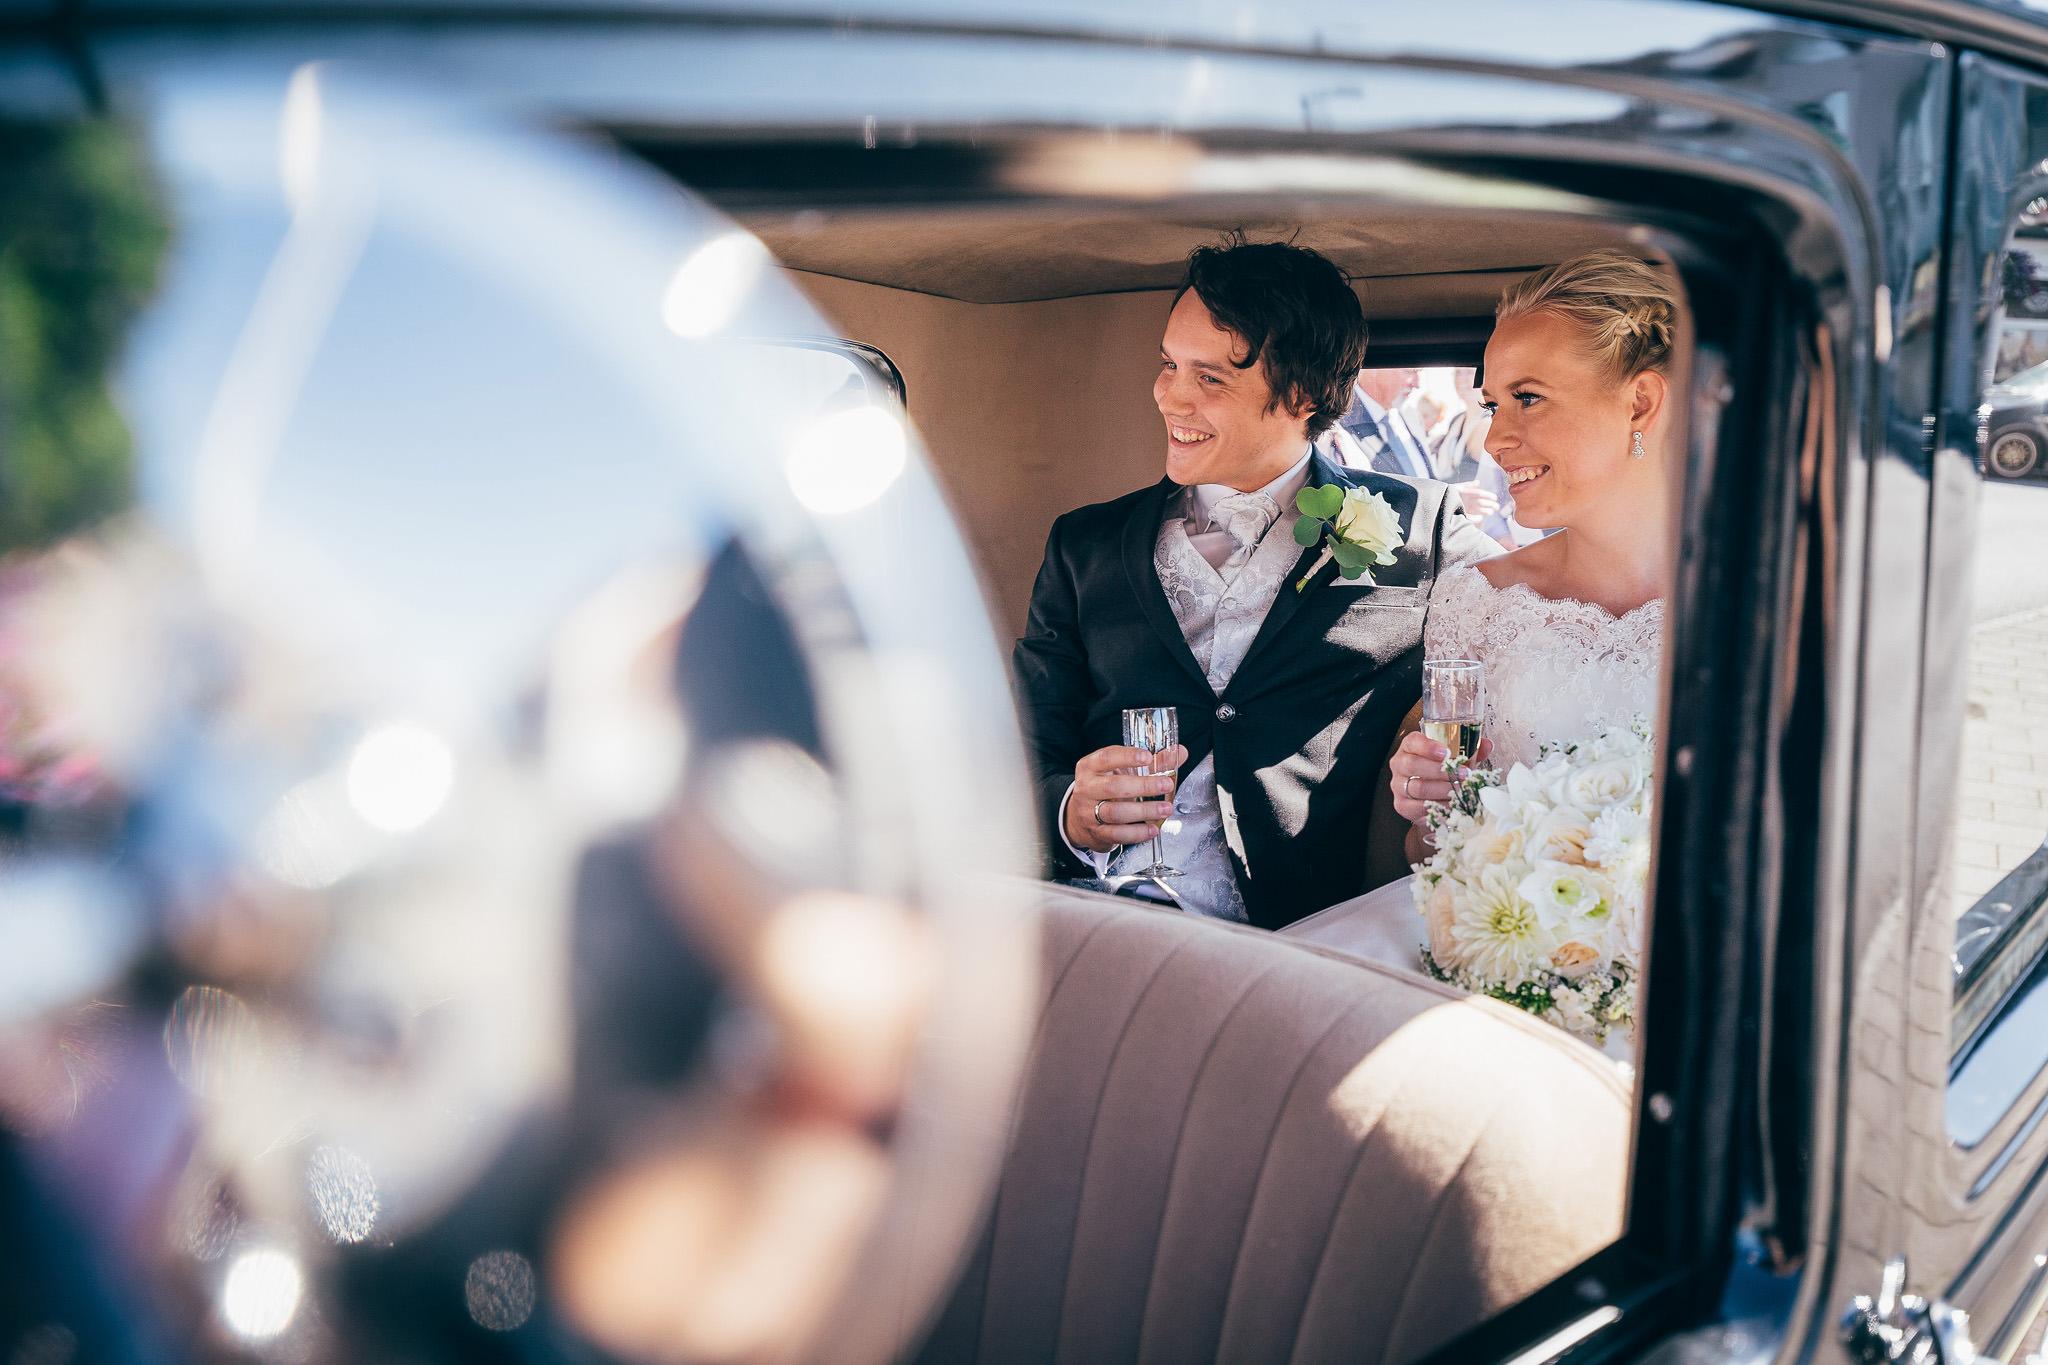 Wedding+Photographer+Norway+Bryllupsfotograf+Casey+Arneson+JT-79.jpg